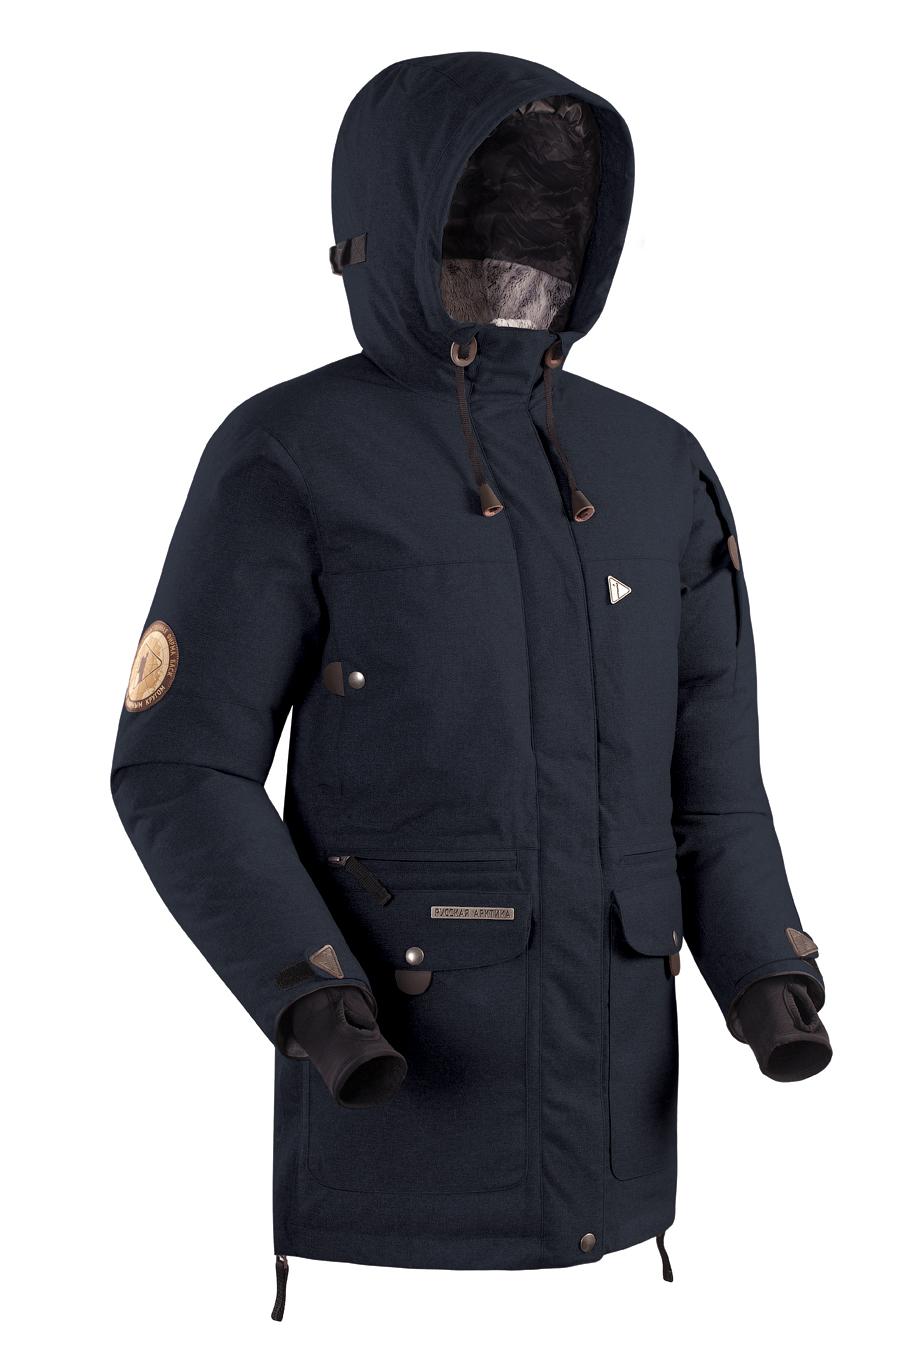 Пуховая куртка BASK IREMEL SOFT фото